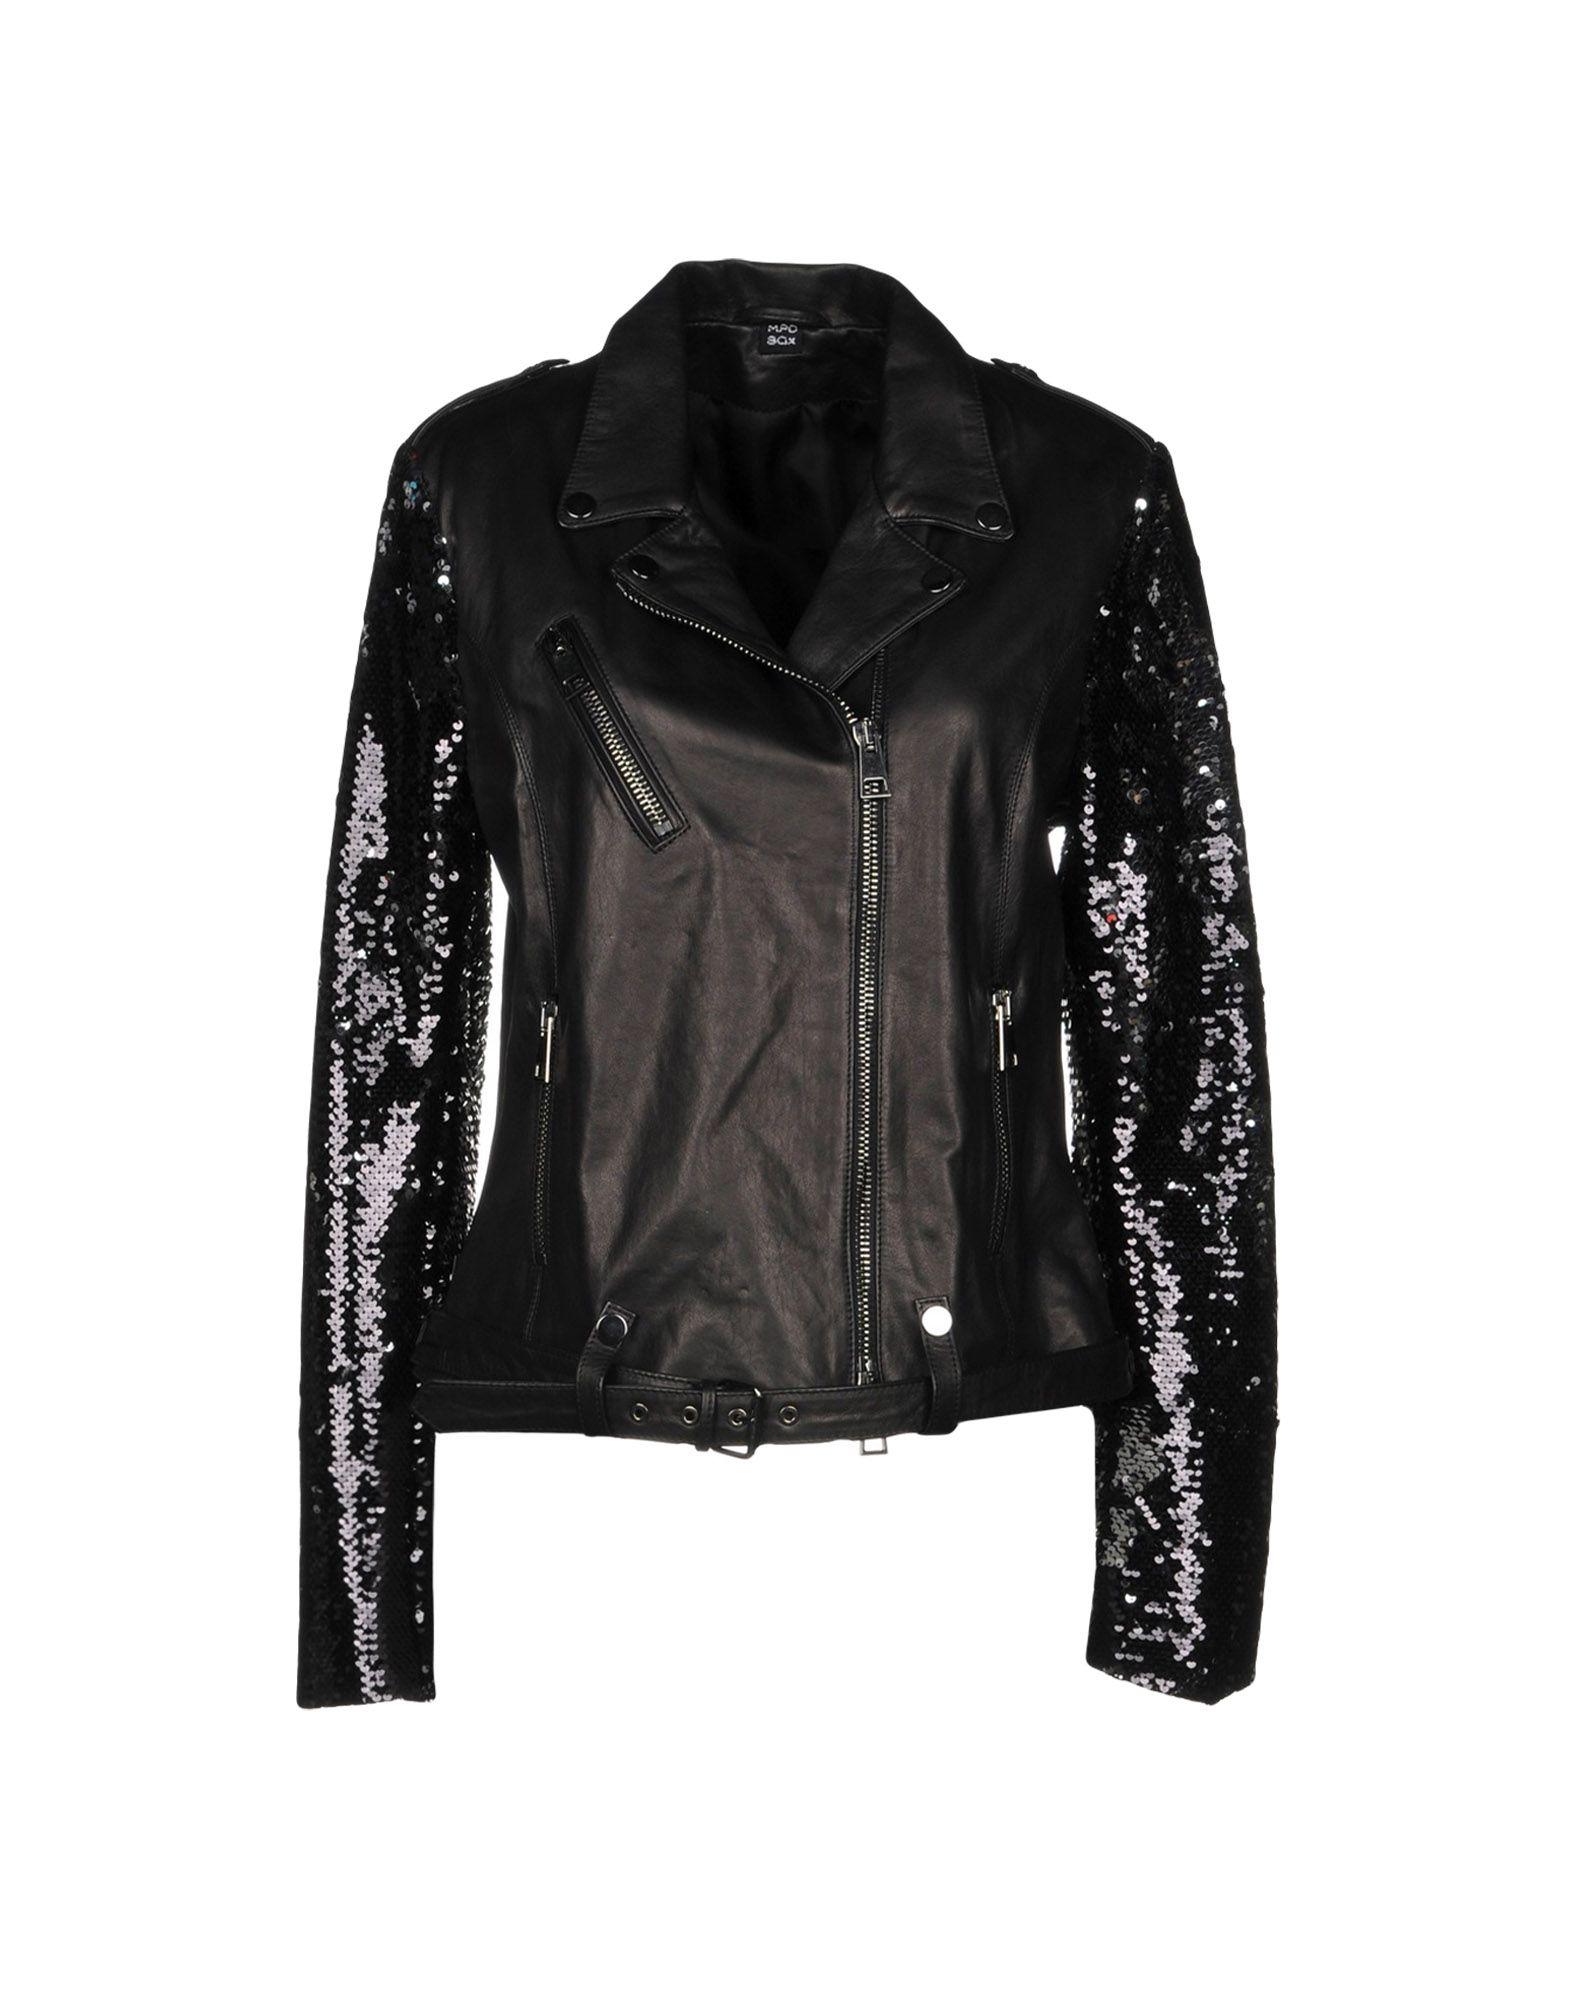 MPD BOX Biker Jacket in Black